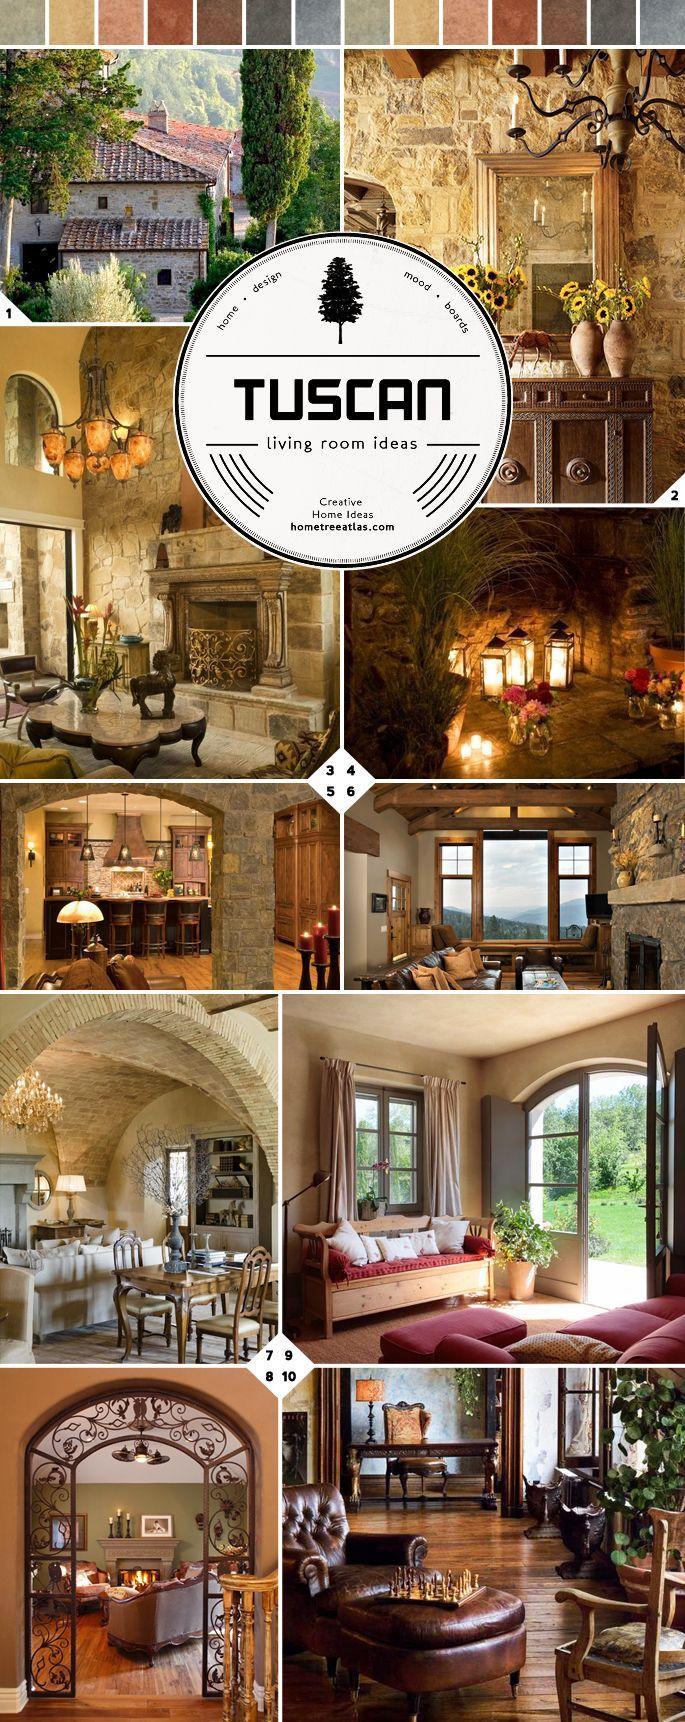 From Italy Tuscan Living Room Ideas Tuscany Decor